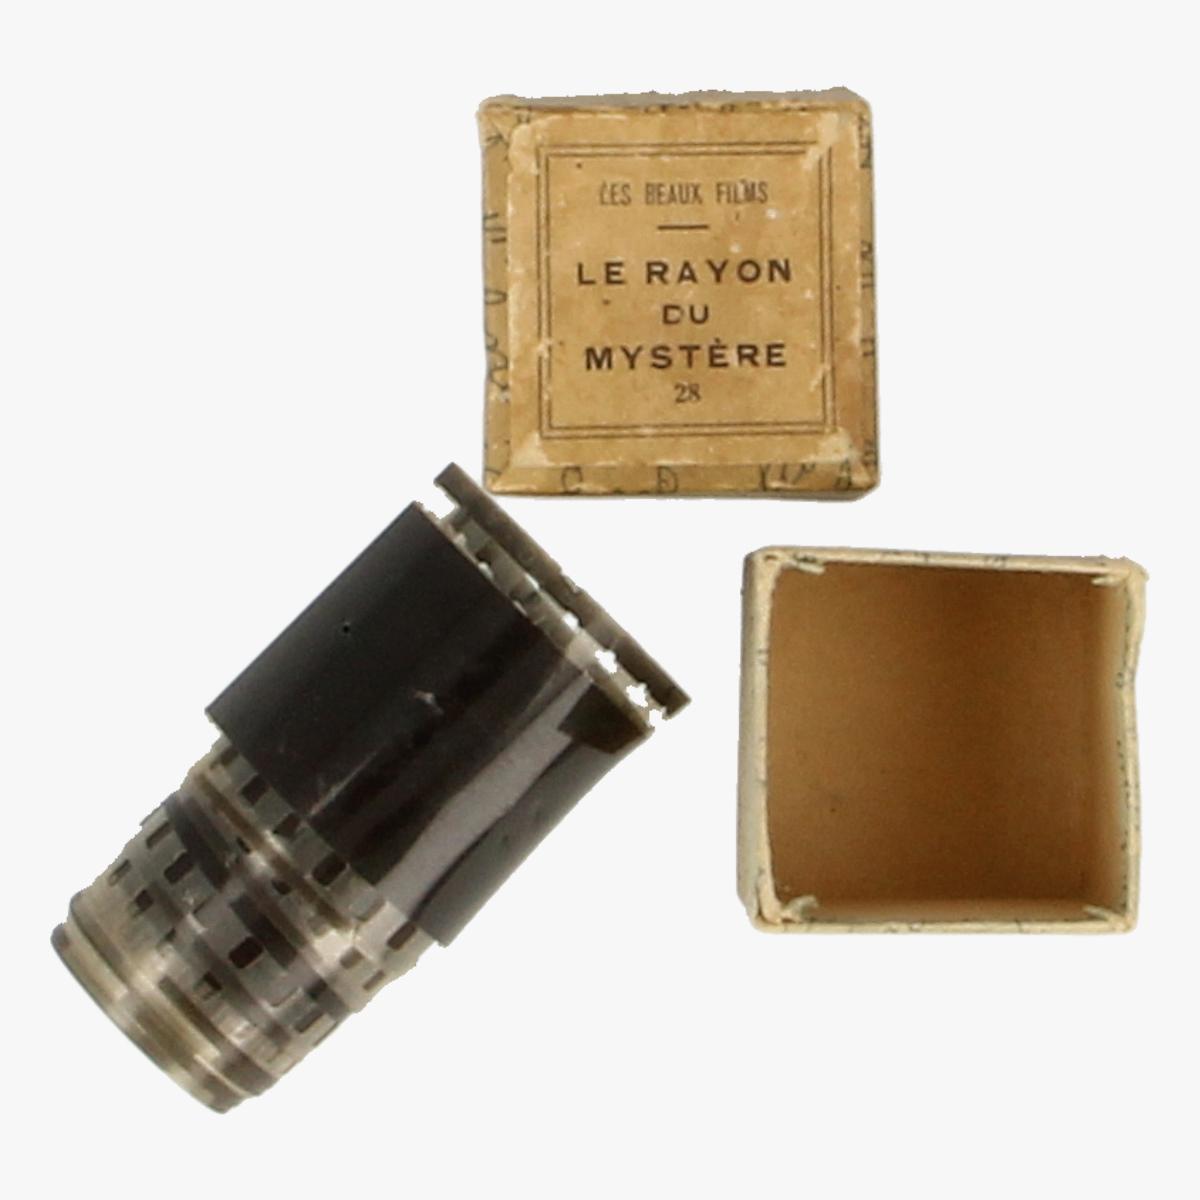 Afbeeldingen van Filmrollen Le Rayon du Mystère. les beaux films.